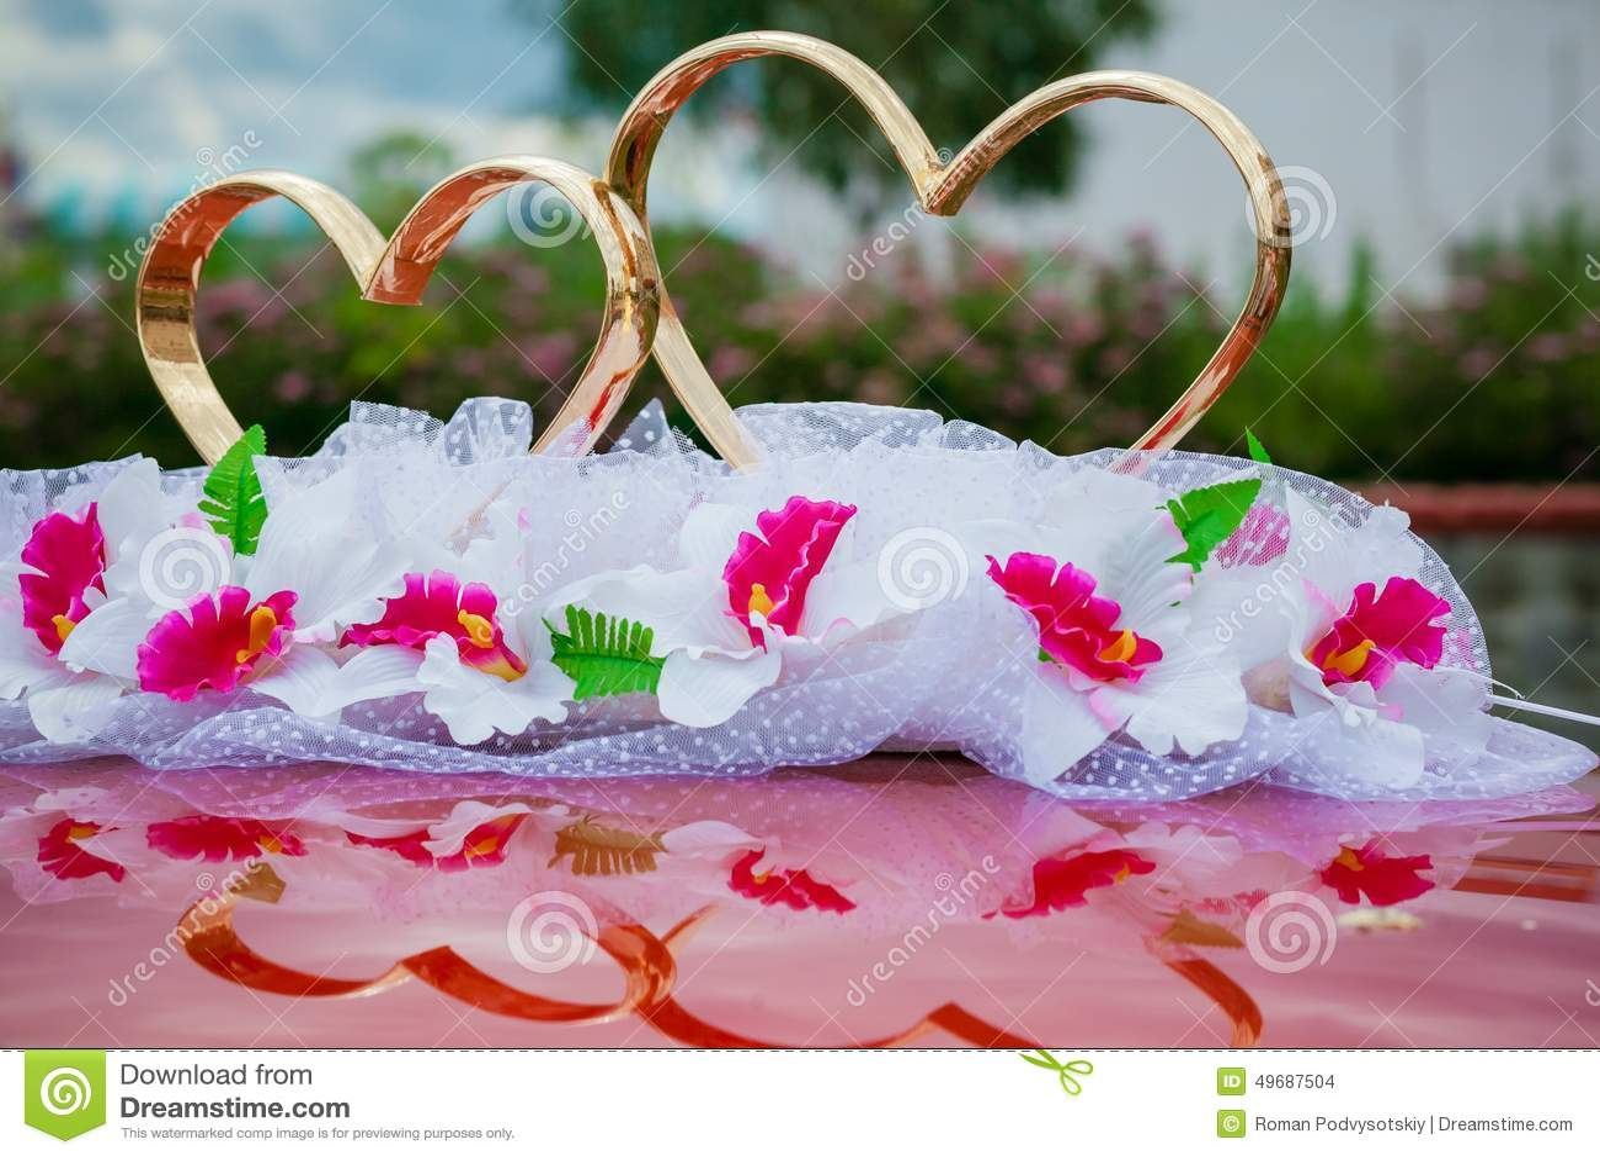 Wedding Car Decorate Wedding Car Decoration Gold Rings Stock Photo Image 49687504